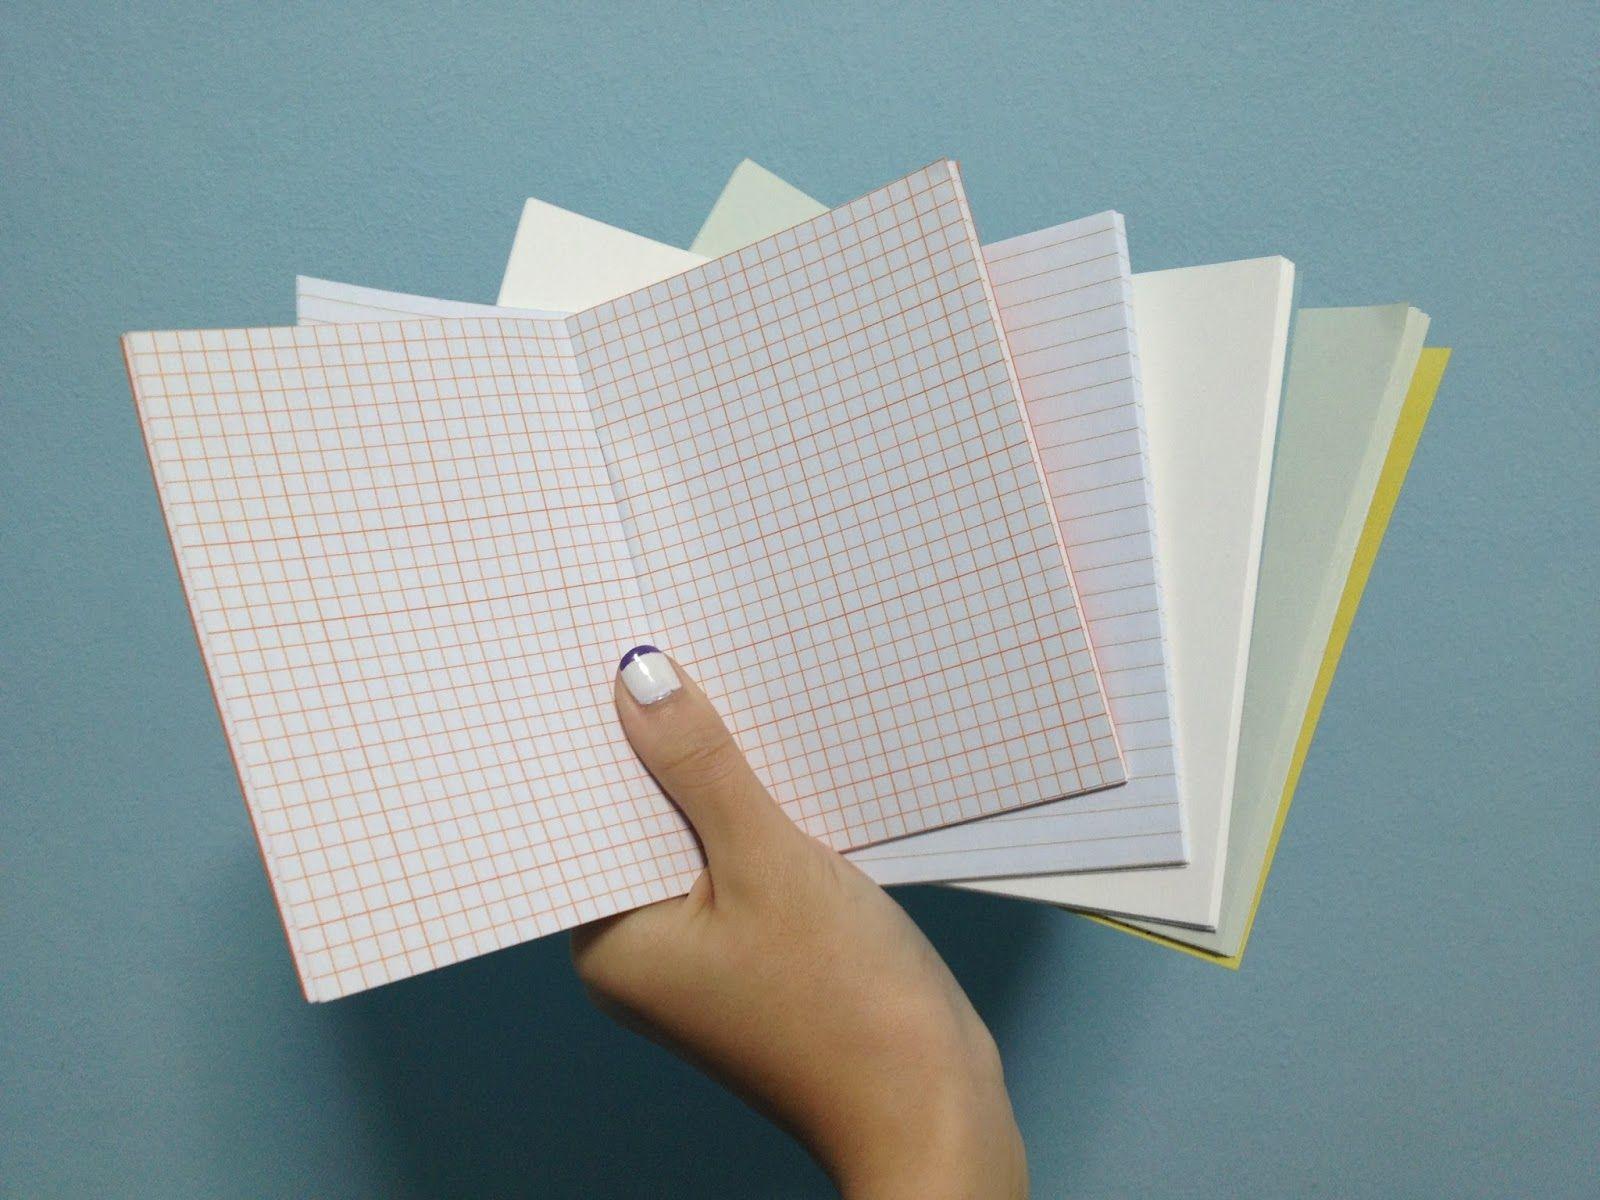 muji graph paper - Google Search | RHIC | Pinterest | Graph paper